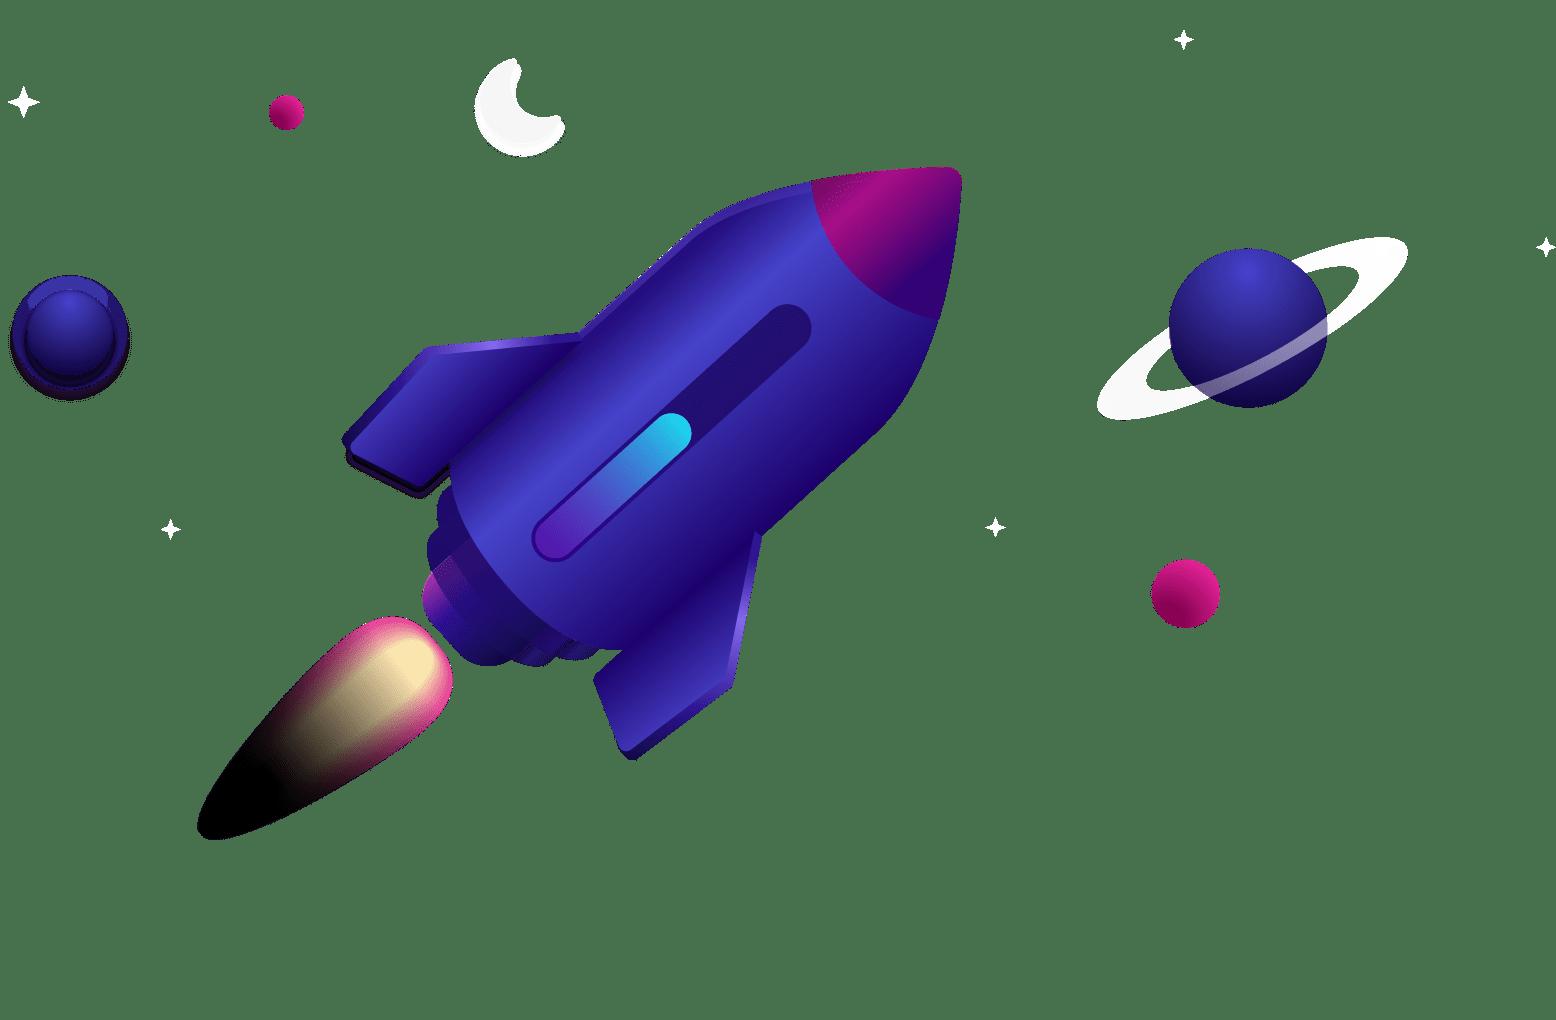 Rocket ship blasting through a solar system, with a progress bar built into the design of the ship.